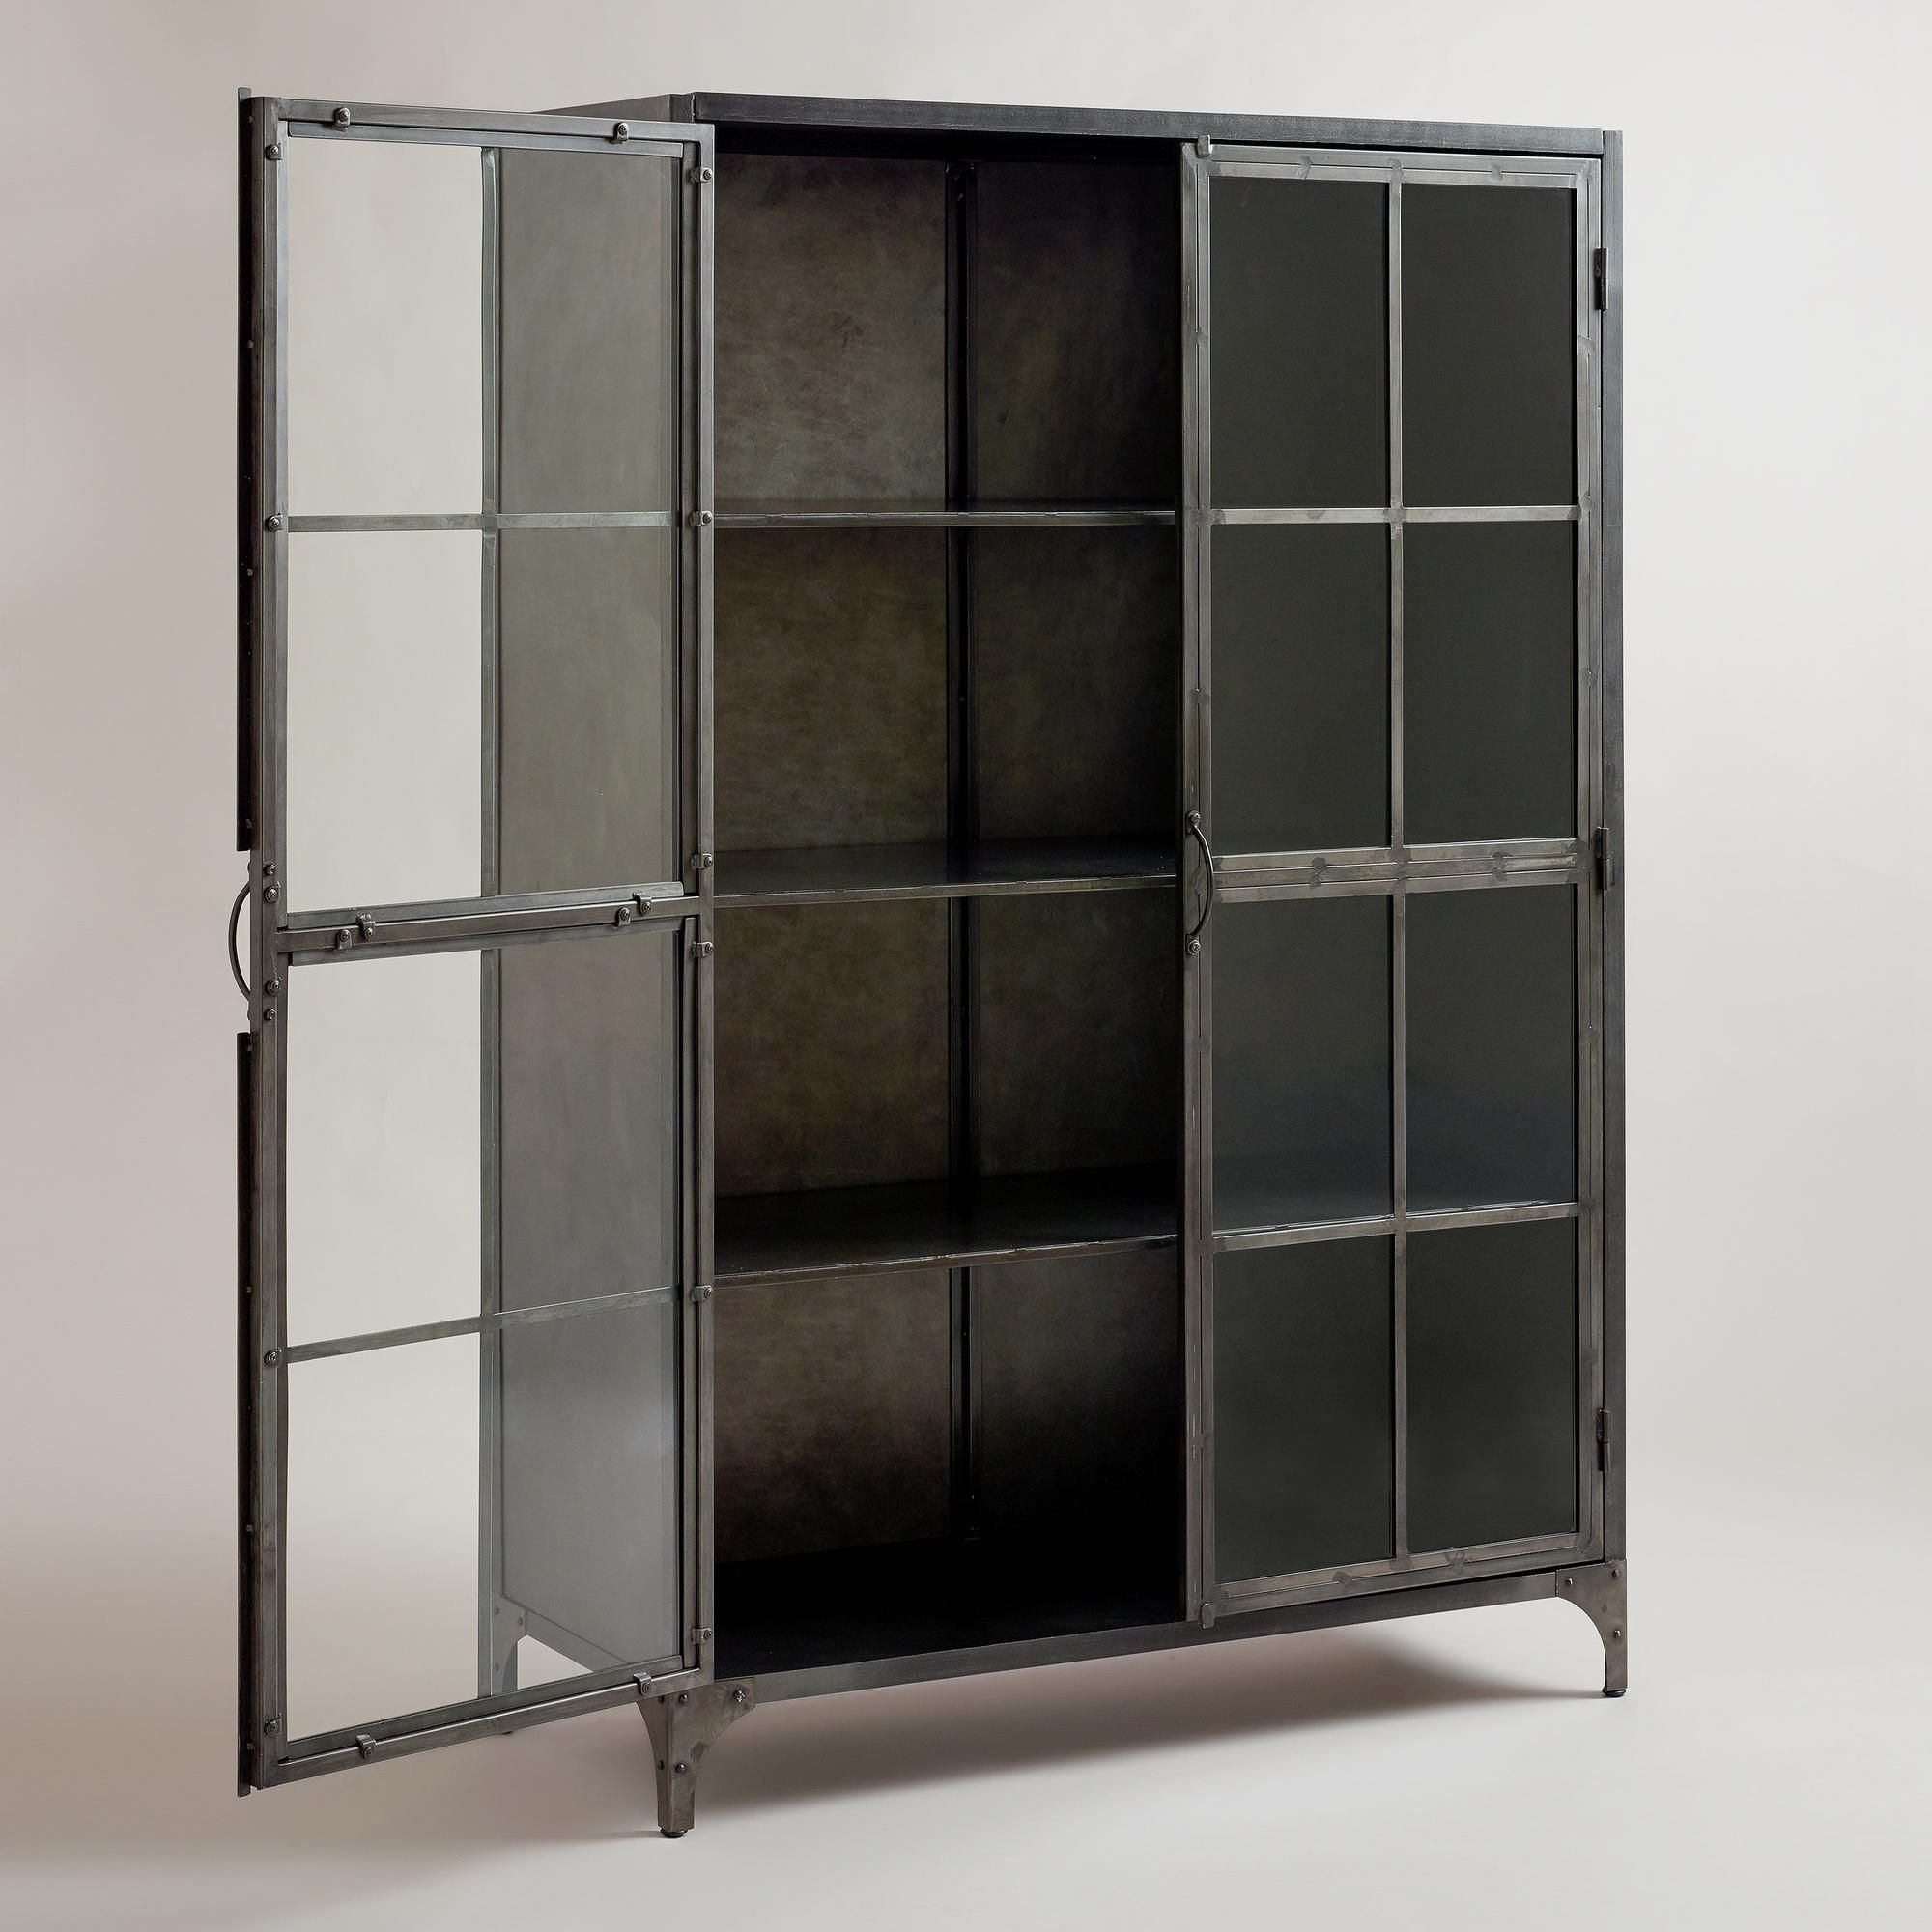 Kitchen Shelf Display: Metal Display Cabinet